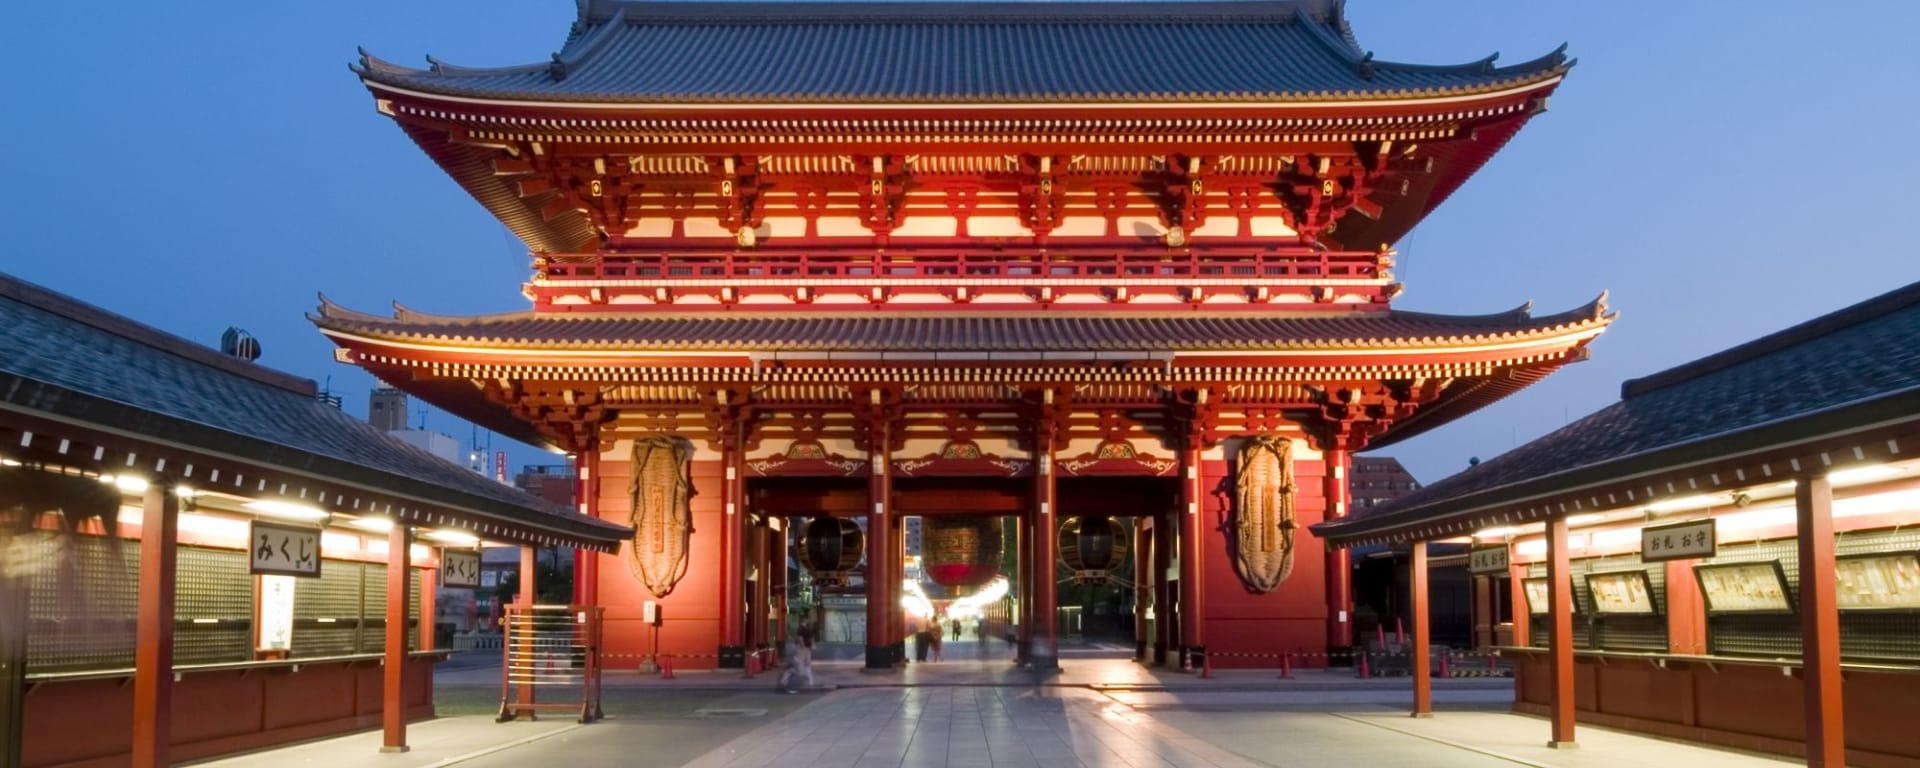 Tokio Highlights – Ganzer Tag: Senso-ji (Kannon) Temple Asakusa